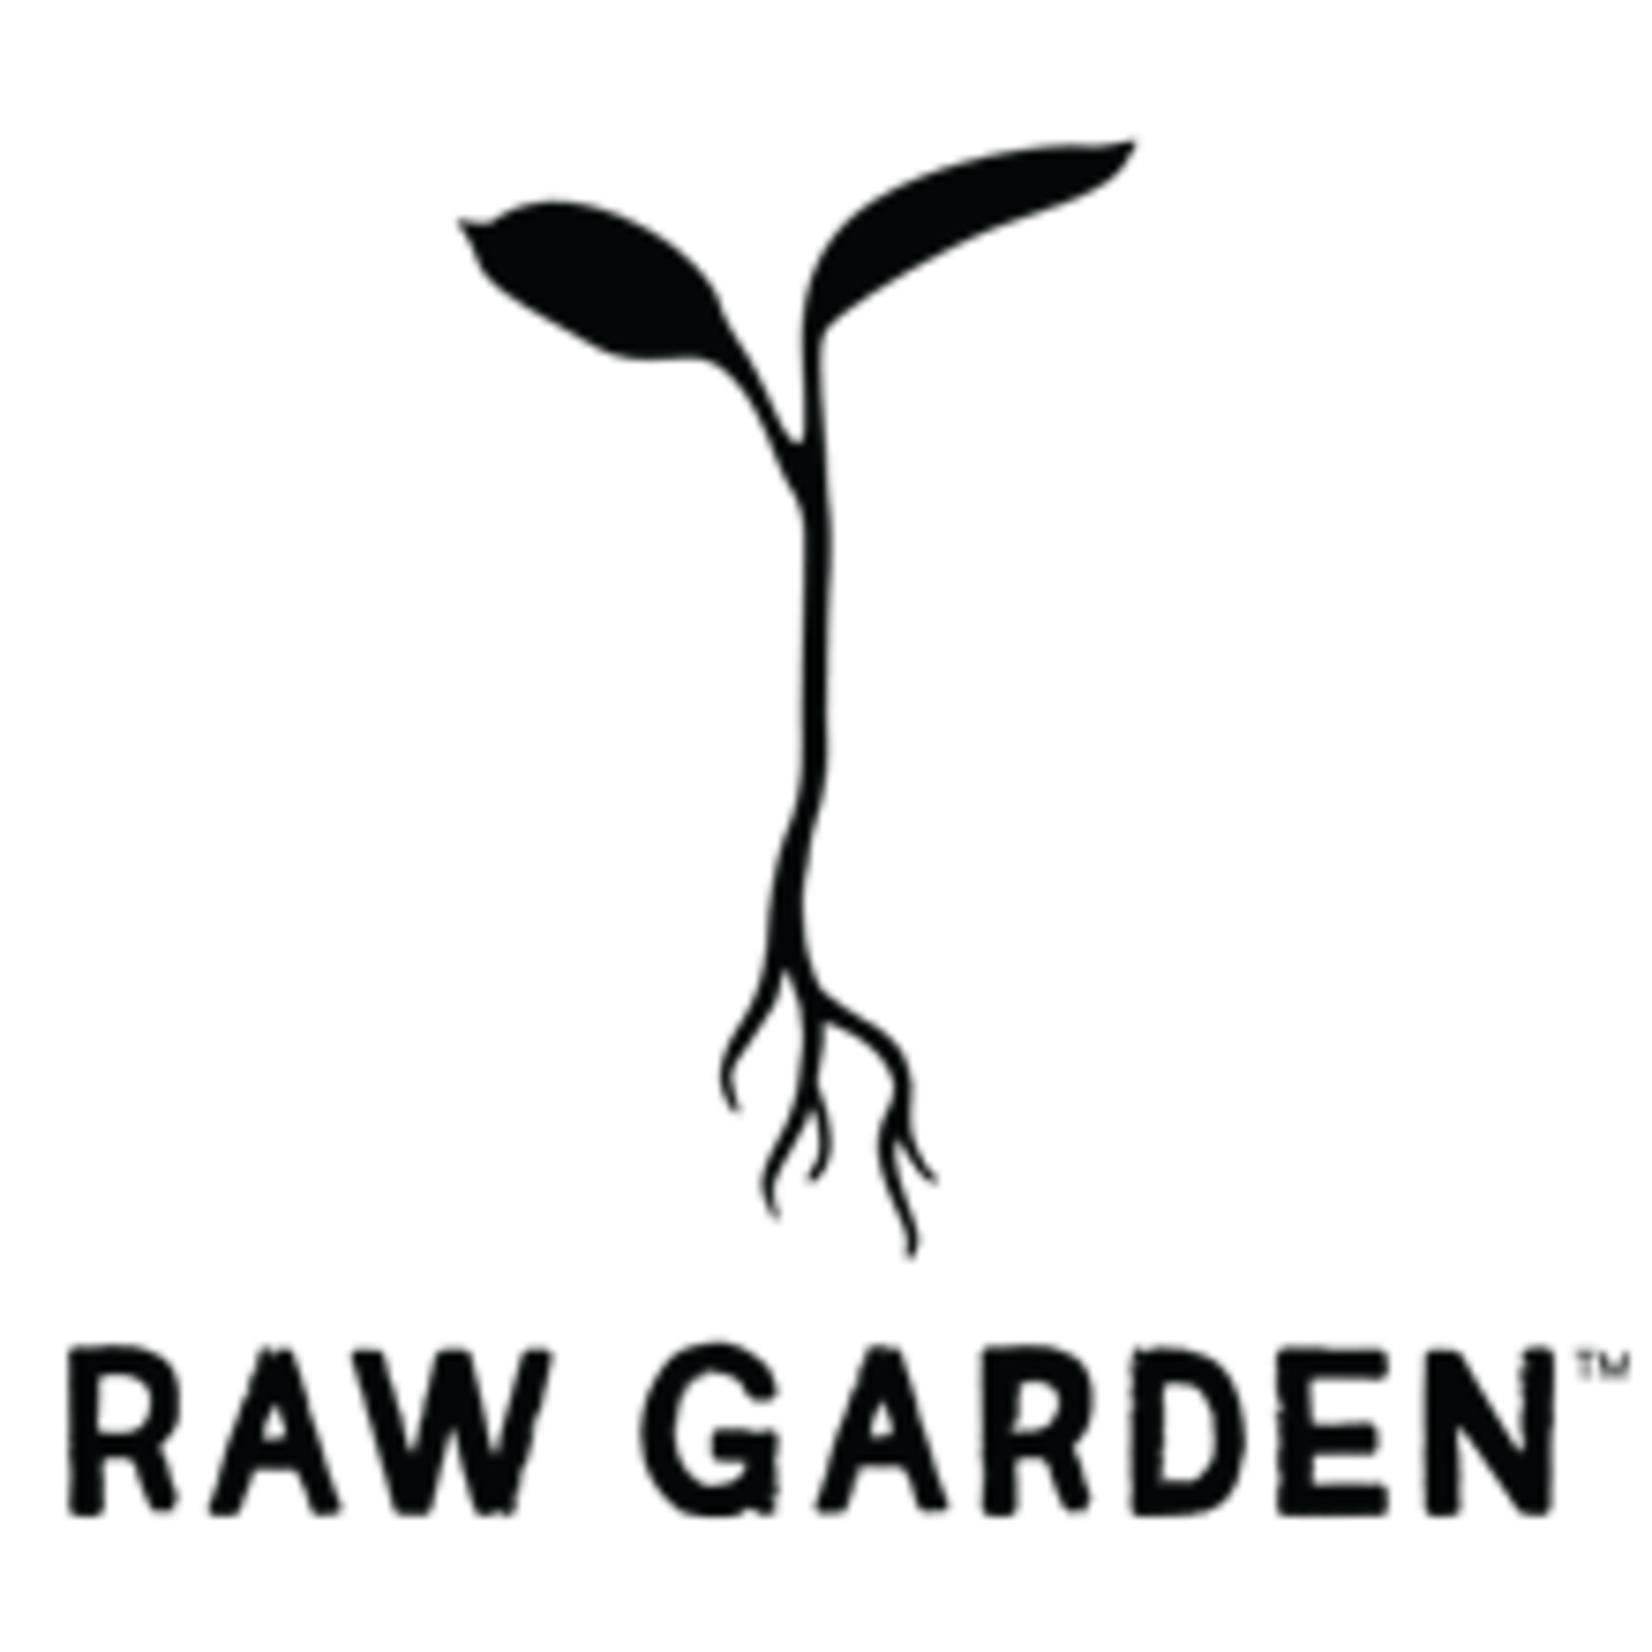 Raw Garden / Cookie Pie #20 (Ready to Use)